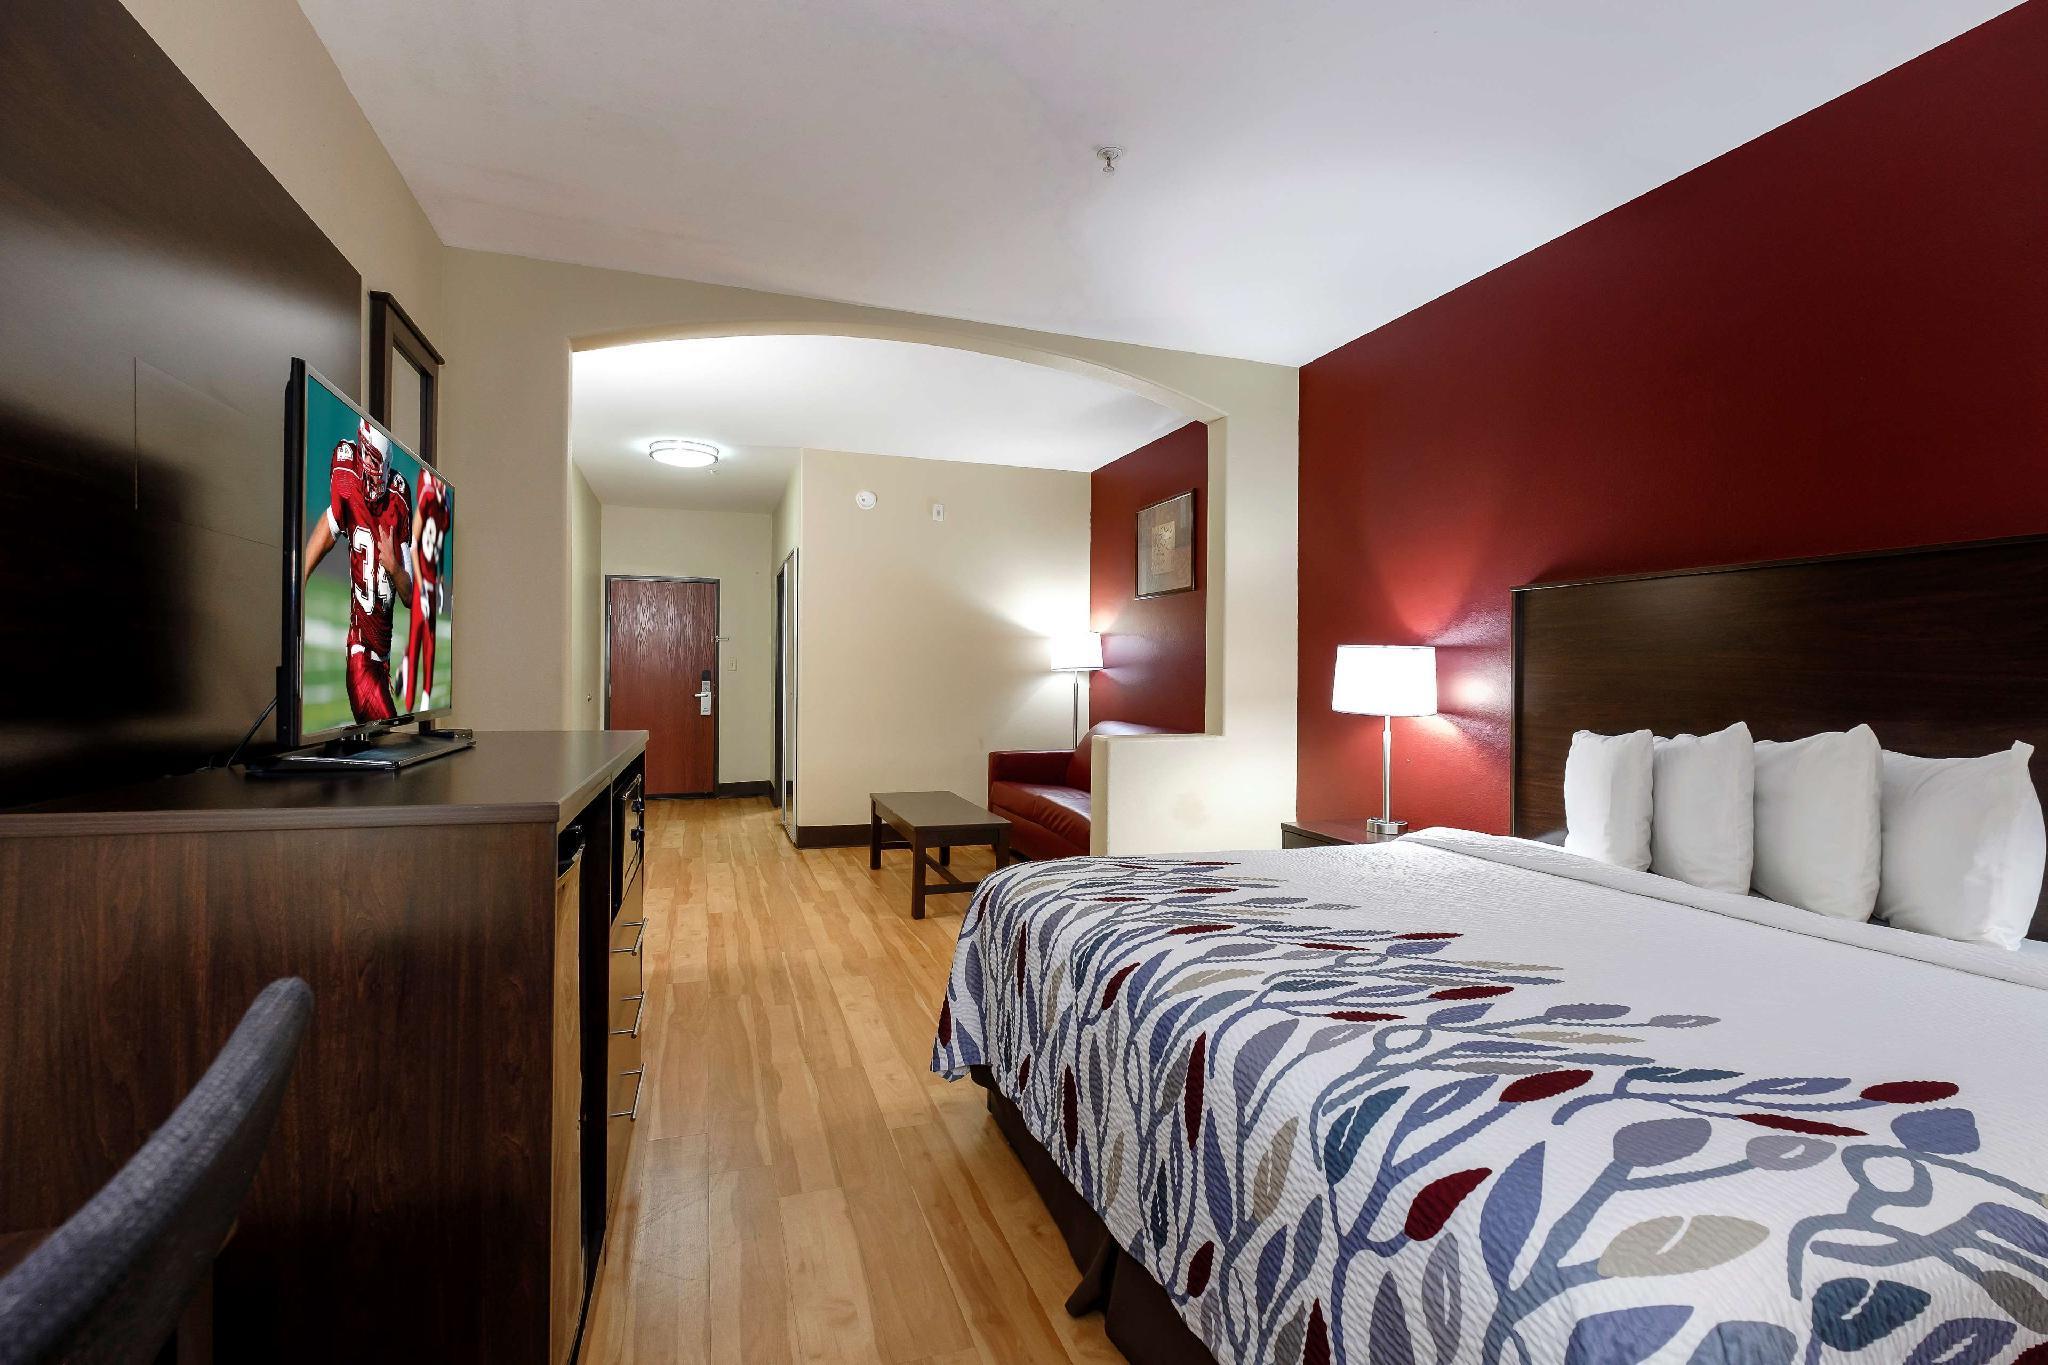 Red Roof Inn Suites Lake Charles Lake Charles La Ab 57